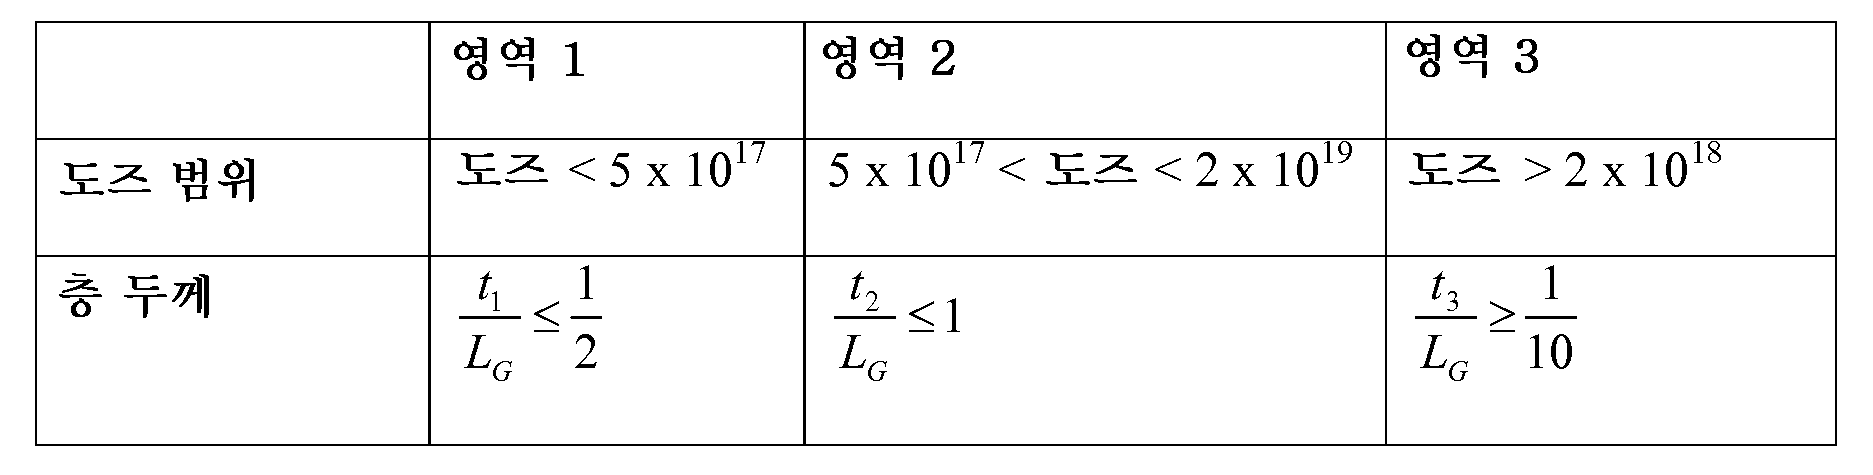 Figure 112012047849278-pct00001